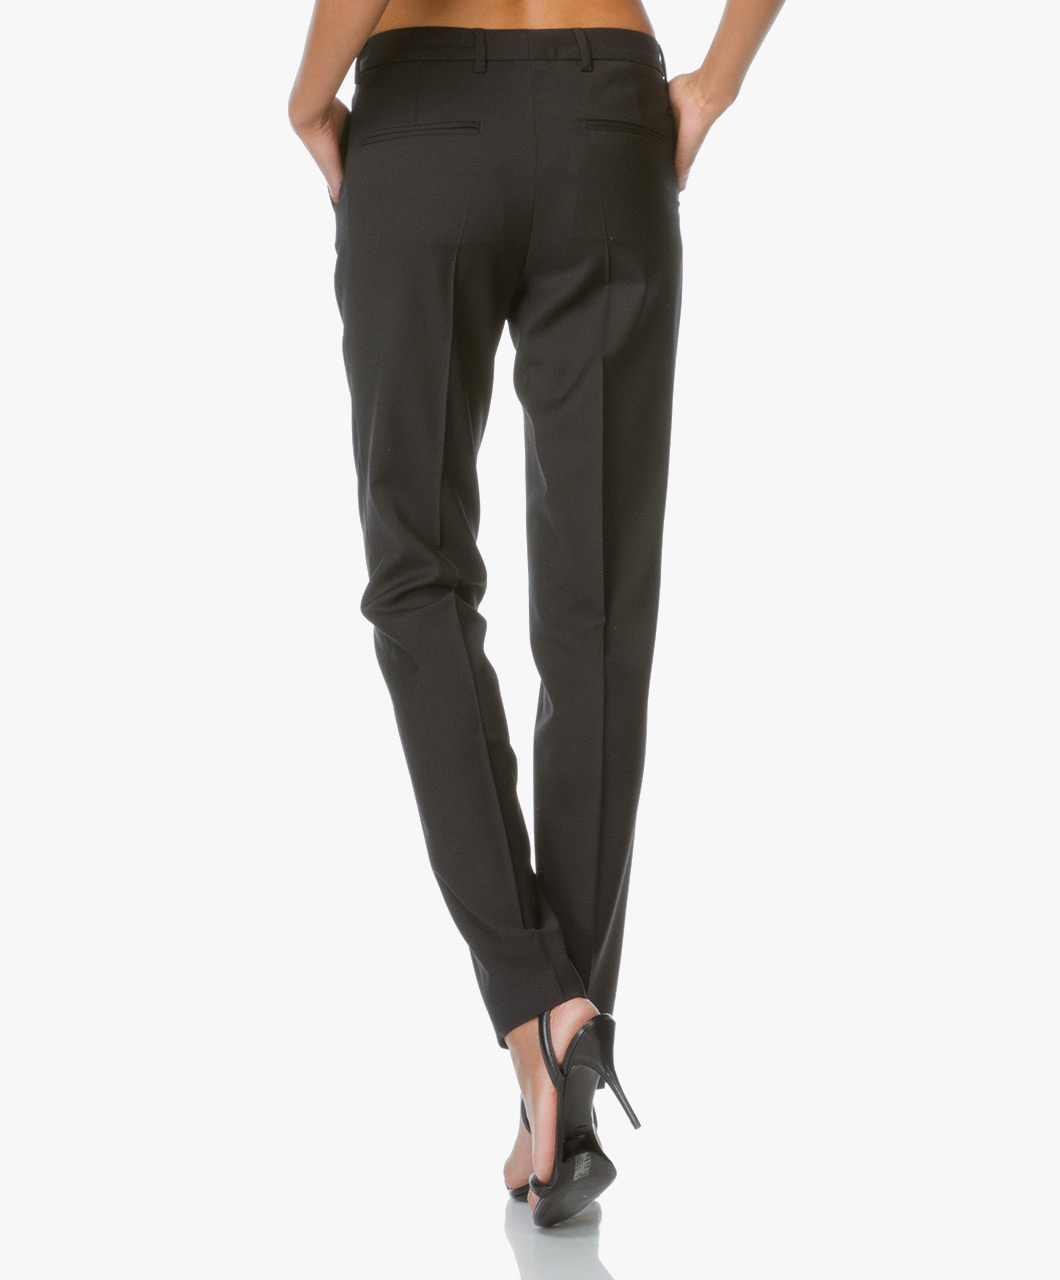 Filippa K Luisa Cool Wool Slacks - Black - 17004 87184e5366d46